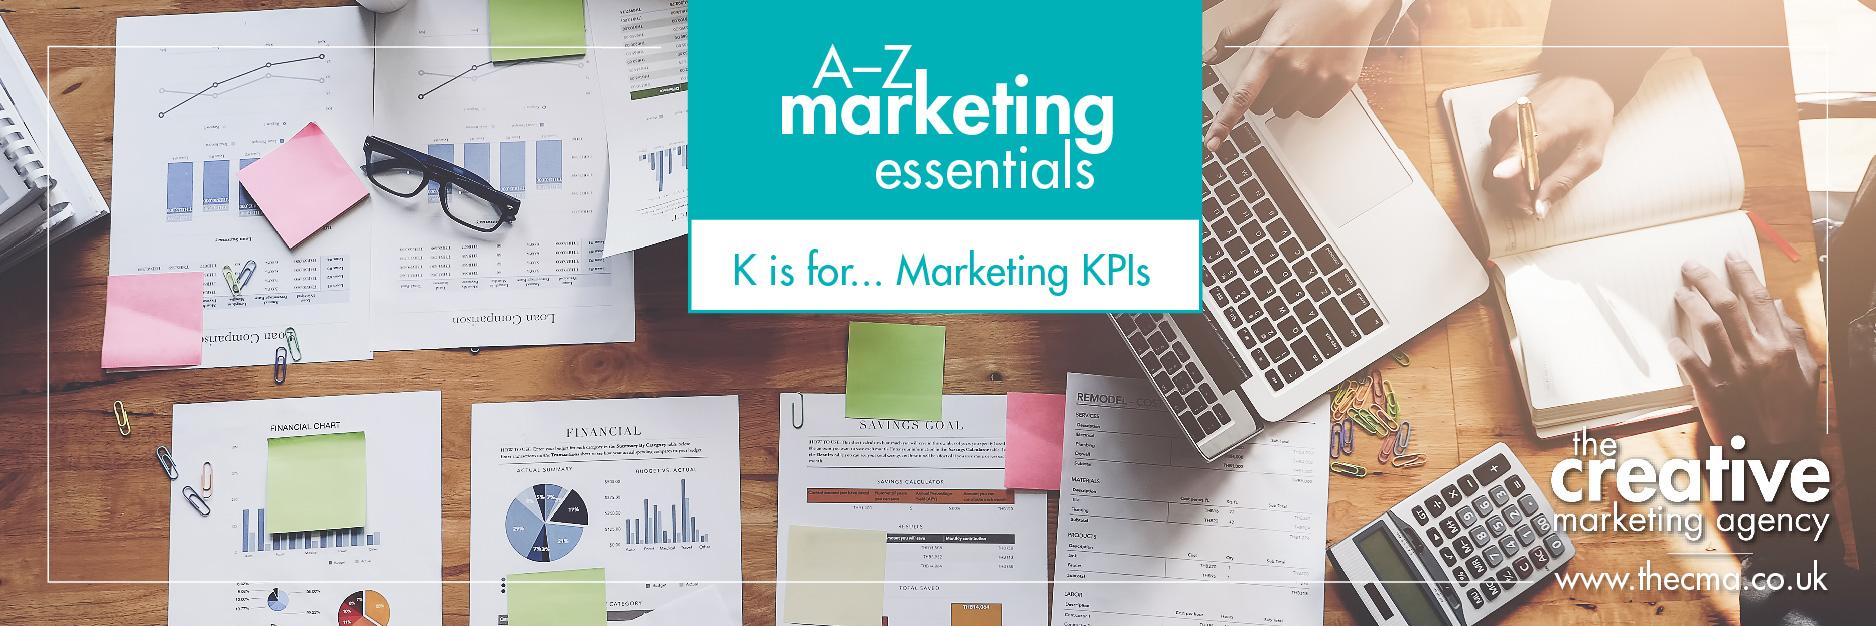 Marketing KPIs - which marketing KPI to use?